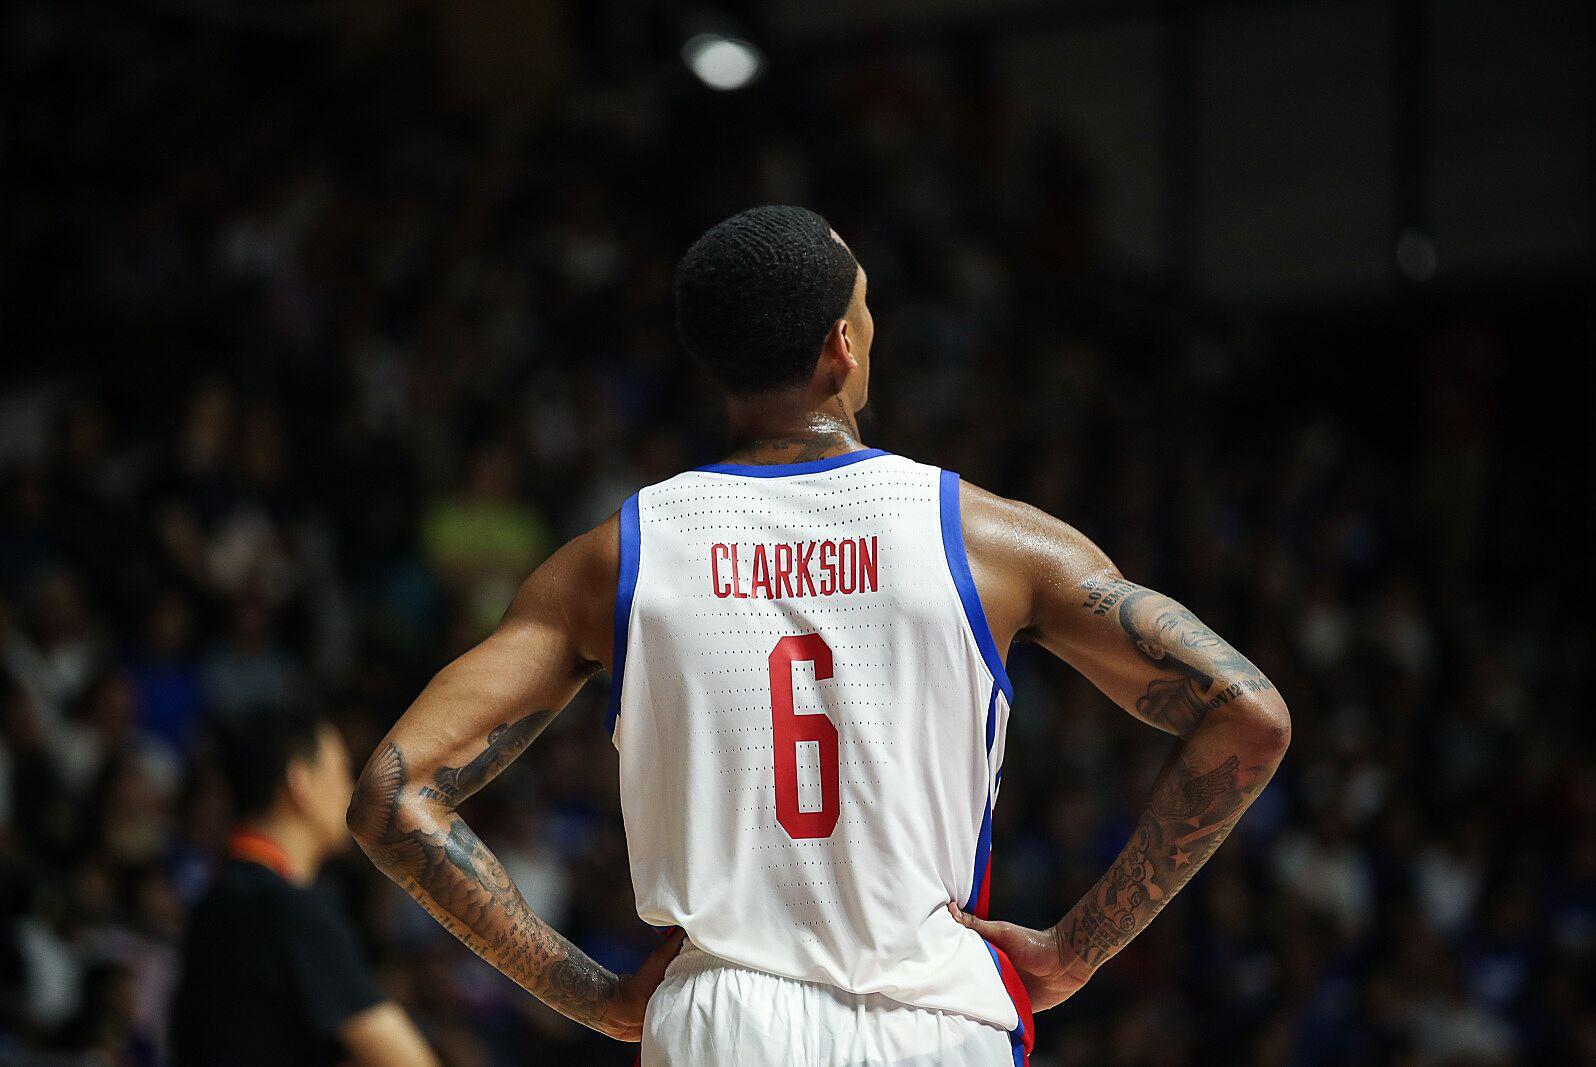 sale retailer 4c41b 27127 Cleveland Cavaliers: Three reasons why Jordan Clarkson is ...